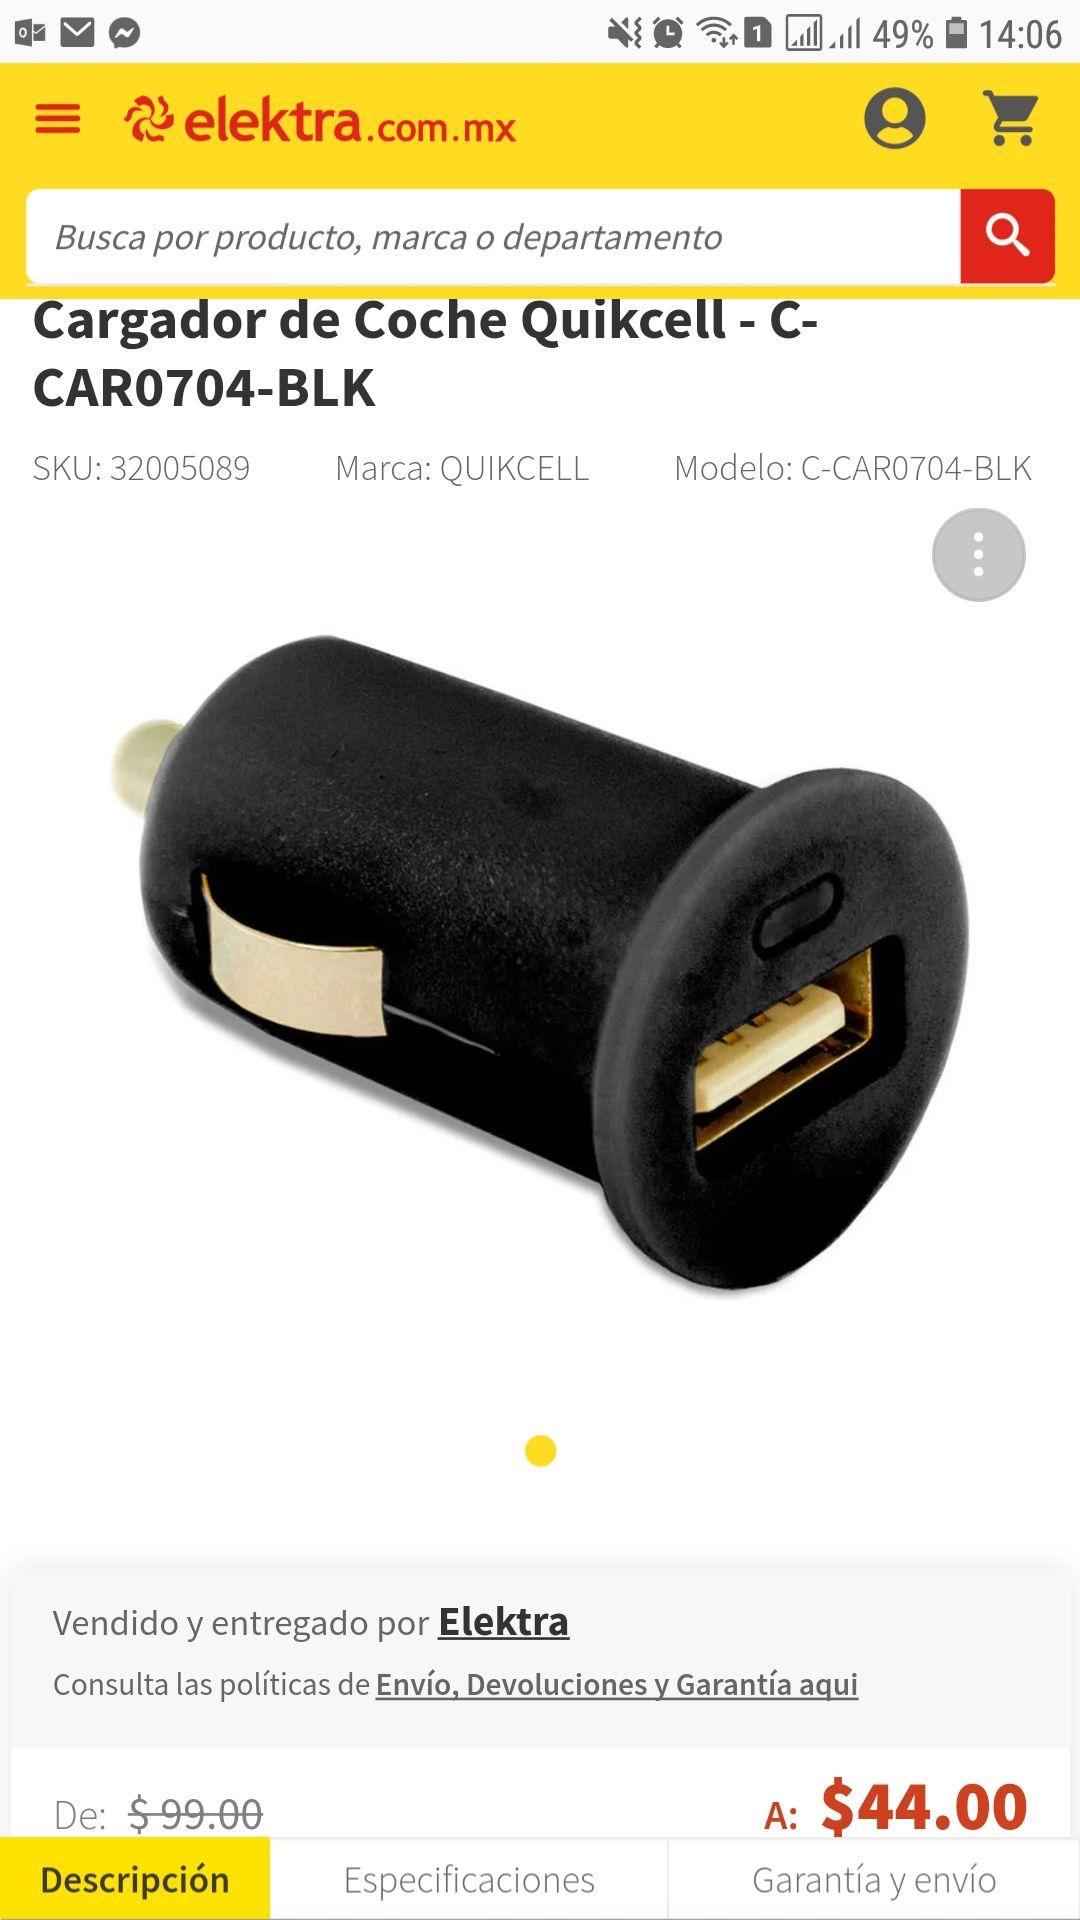 Elektra: Cargador de Coche Quikcell - C-CAR0704-BLK Envio Gratis